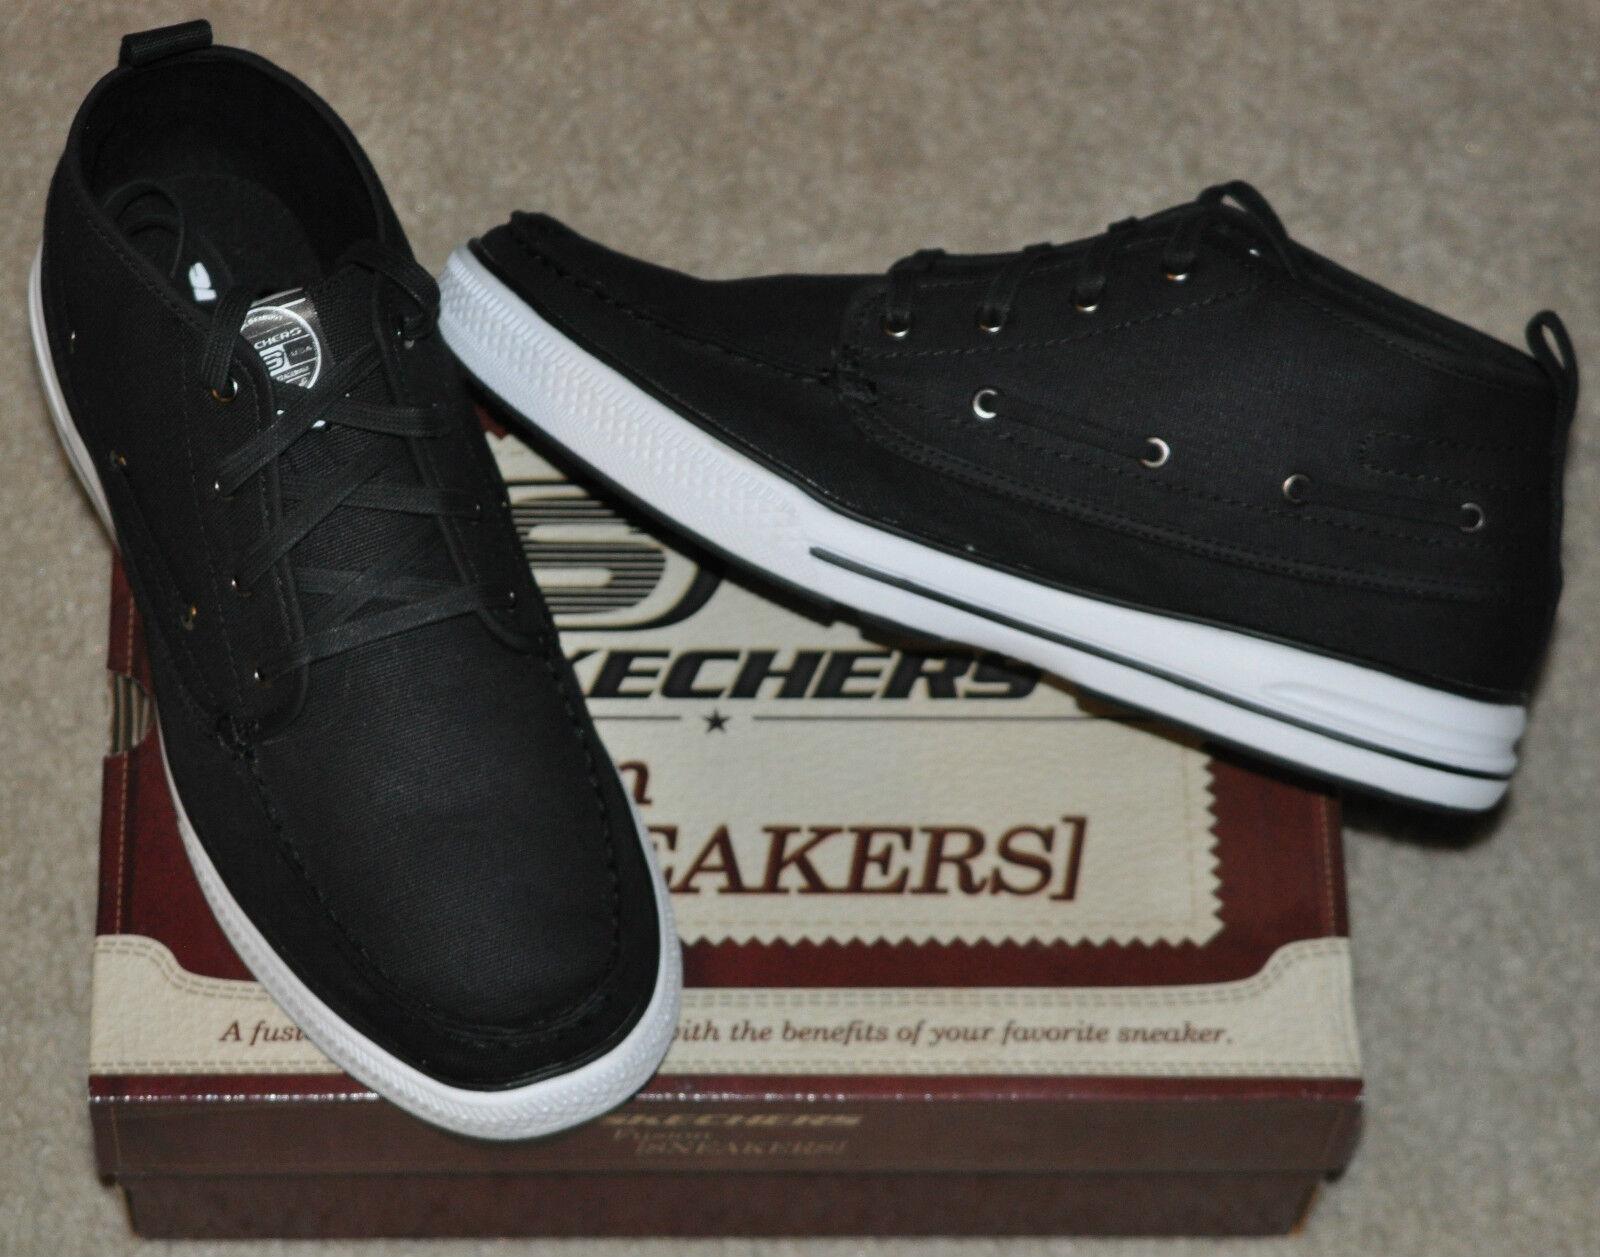 Skechers Arcade Score Hi Top Boat shoes   Sneakers Sz 12 Black Brand New in Box